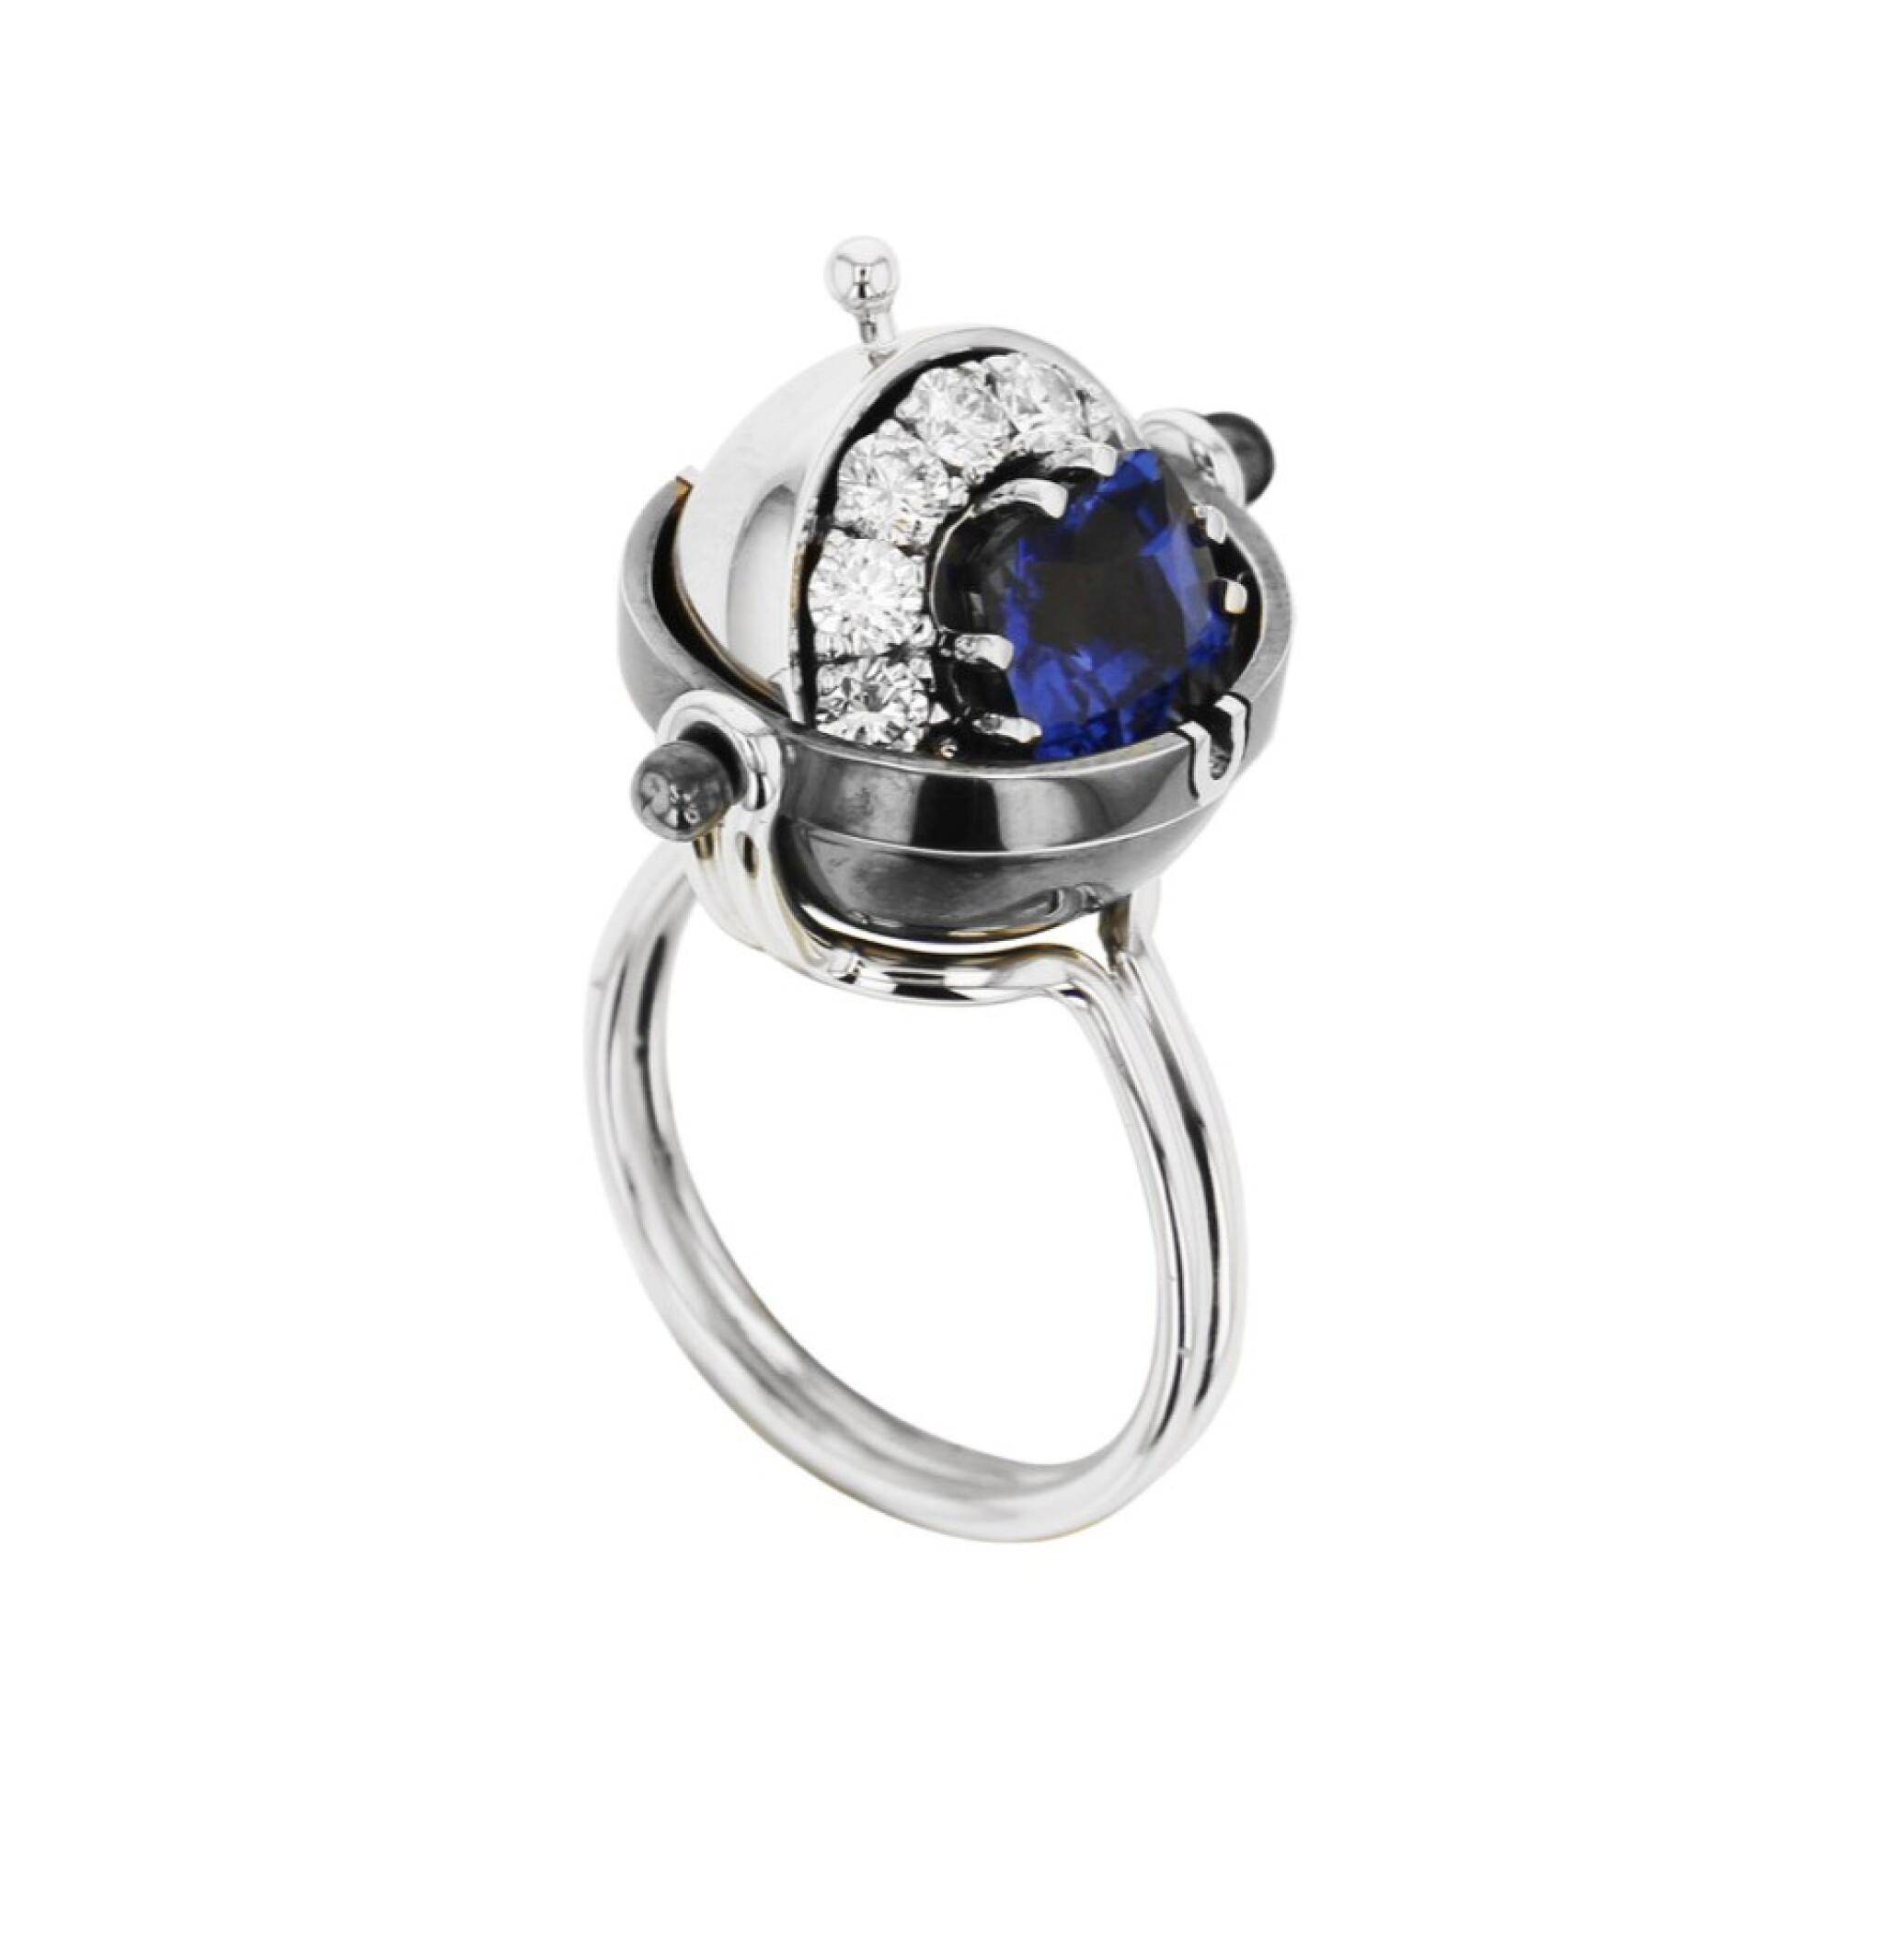 View full screen - View 1 of Lot 3. Elie Top, Sapphire and Diamond Ring [Bague Saphir et Diamants], 'Sirius'.